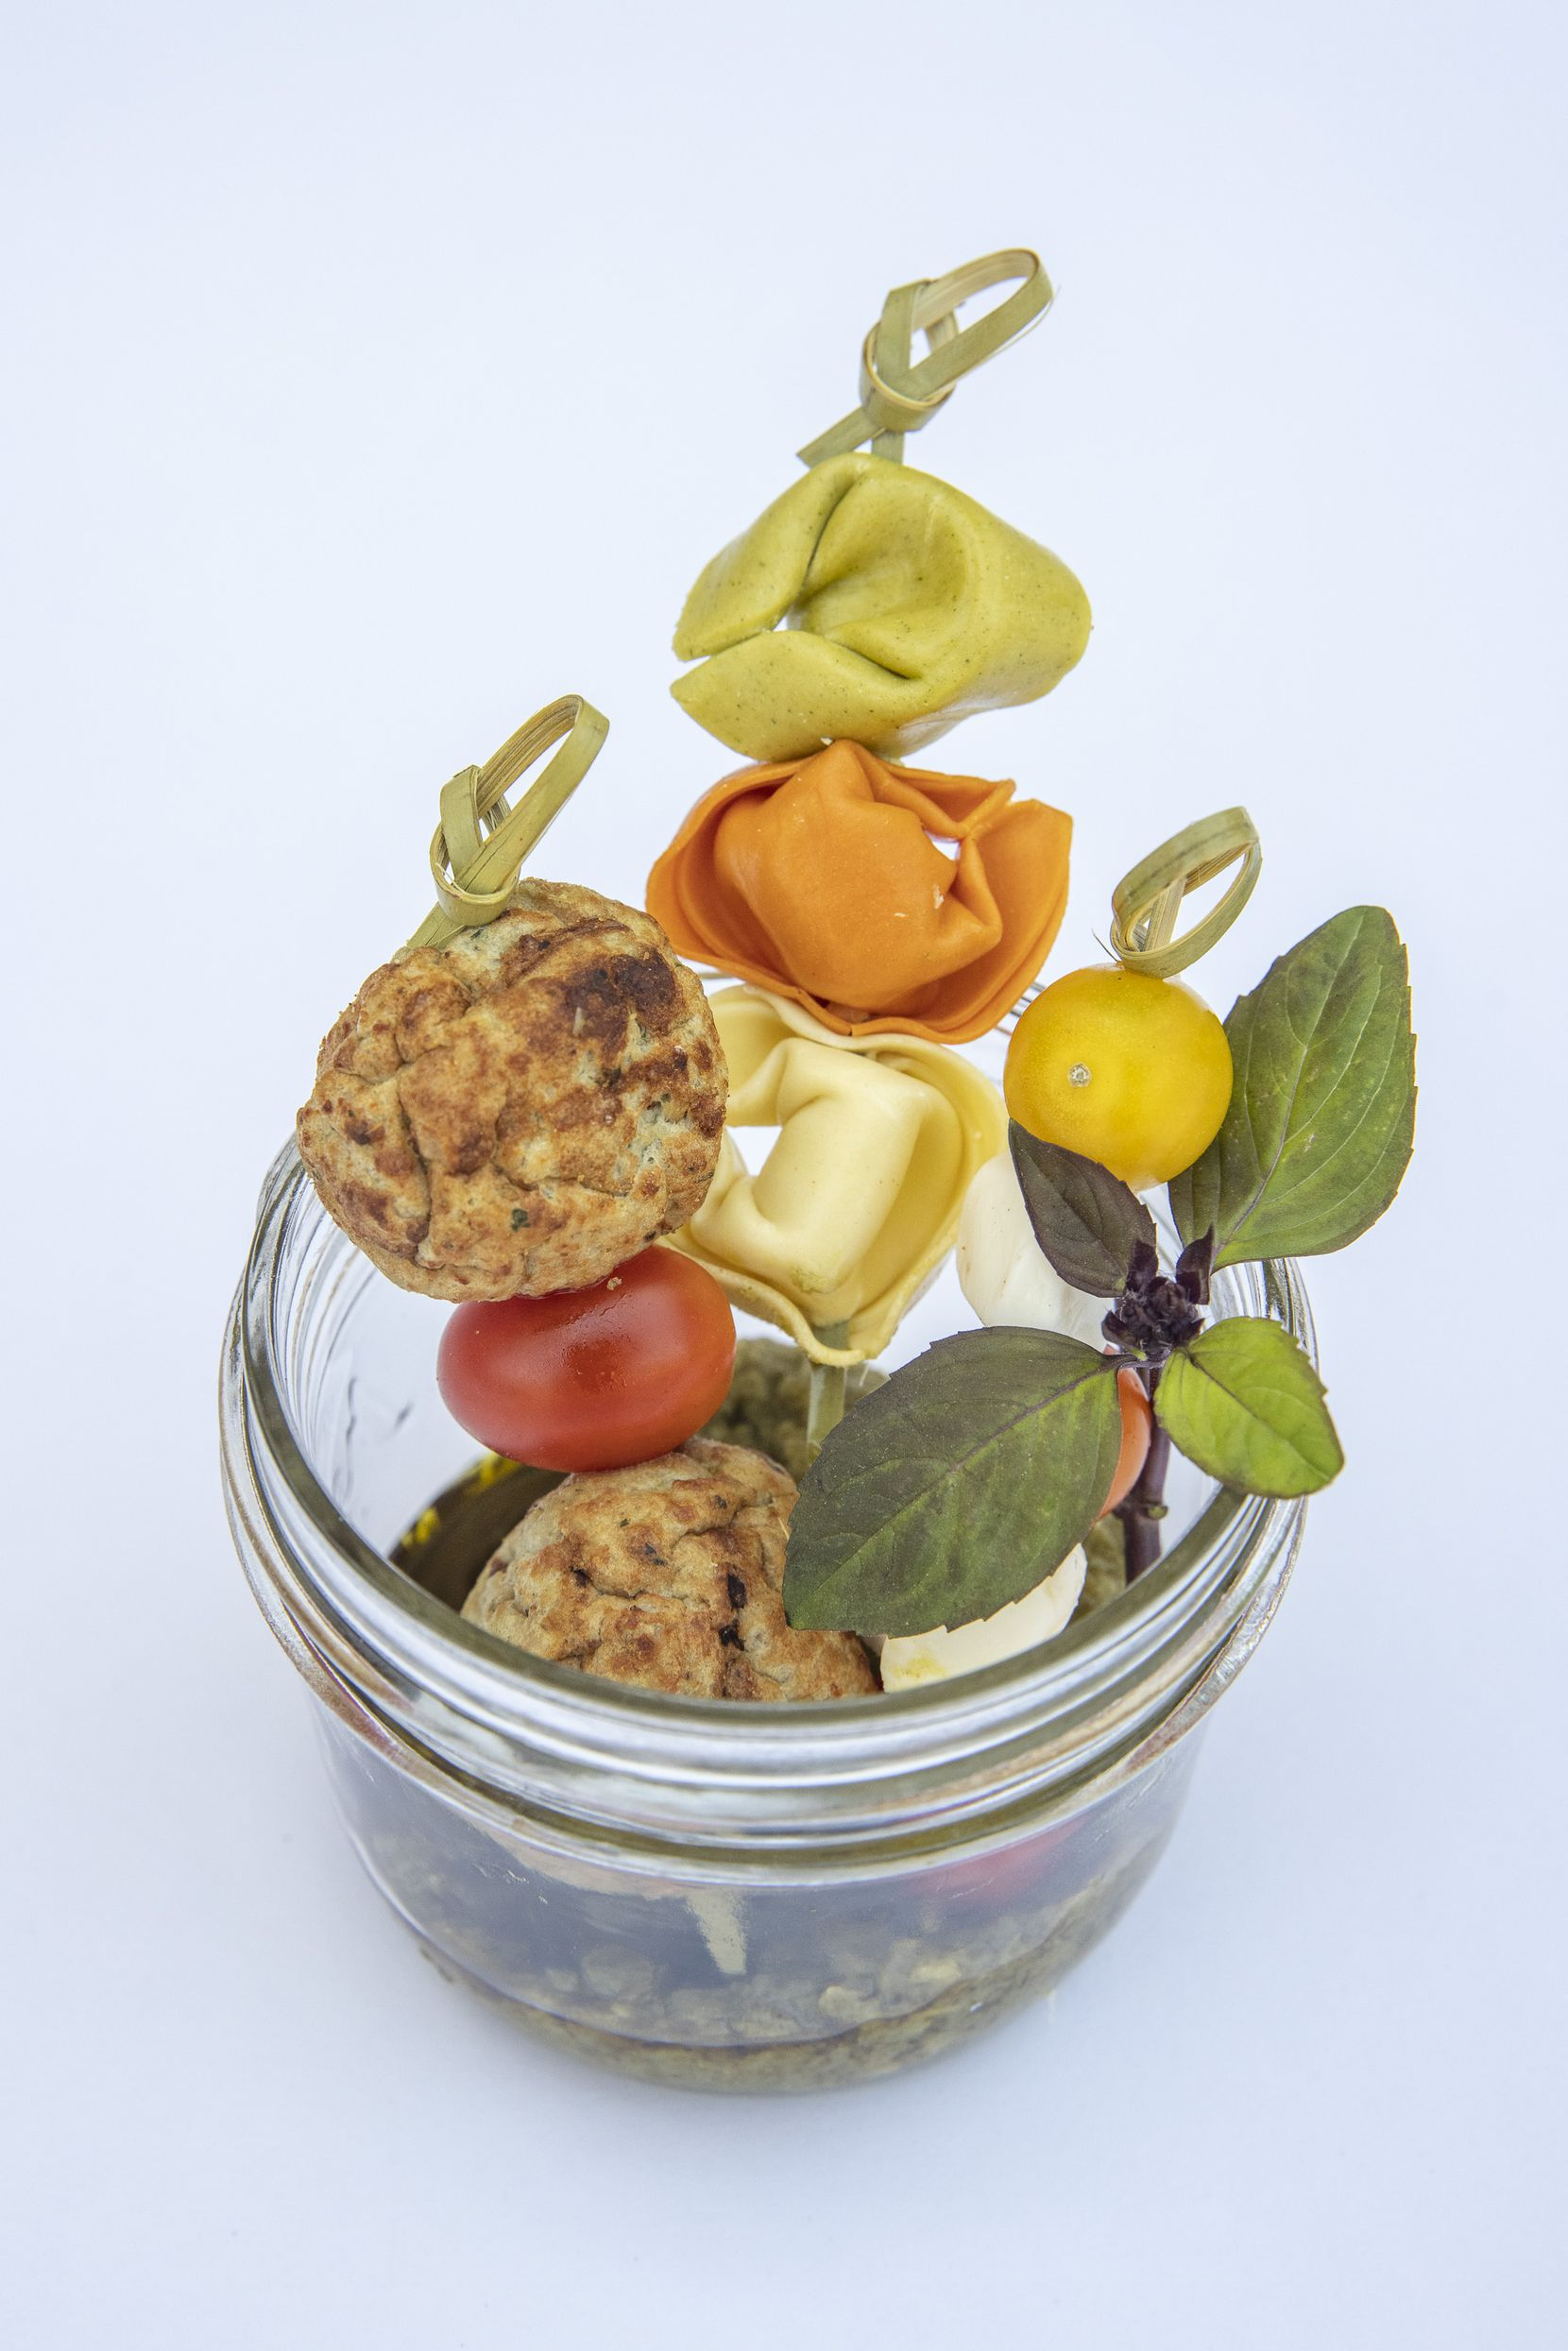 The Meatballs With Pesto jar